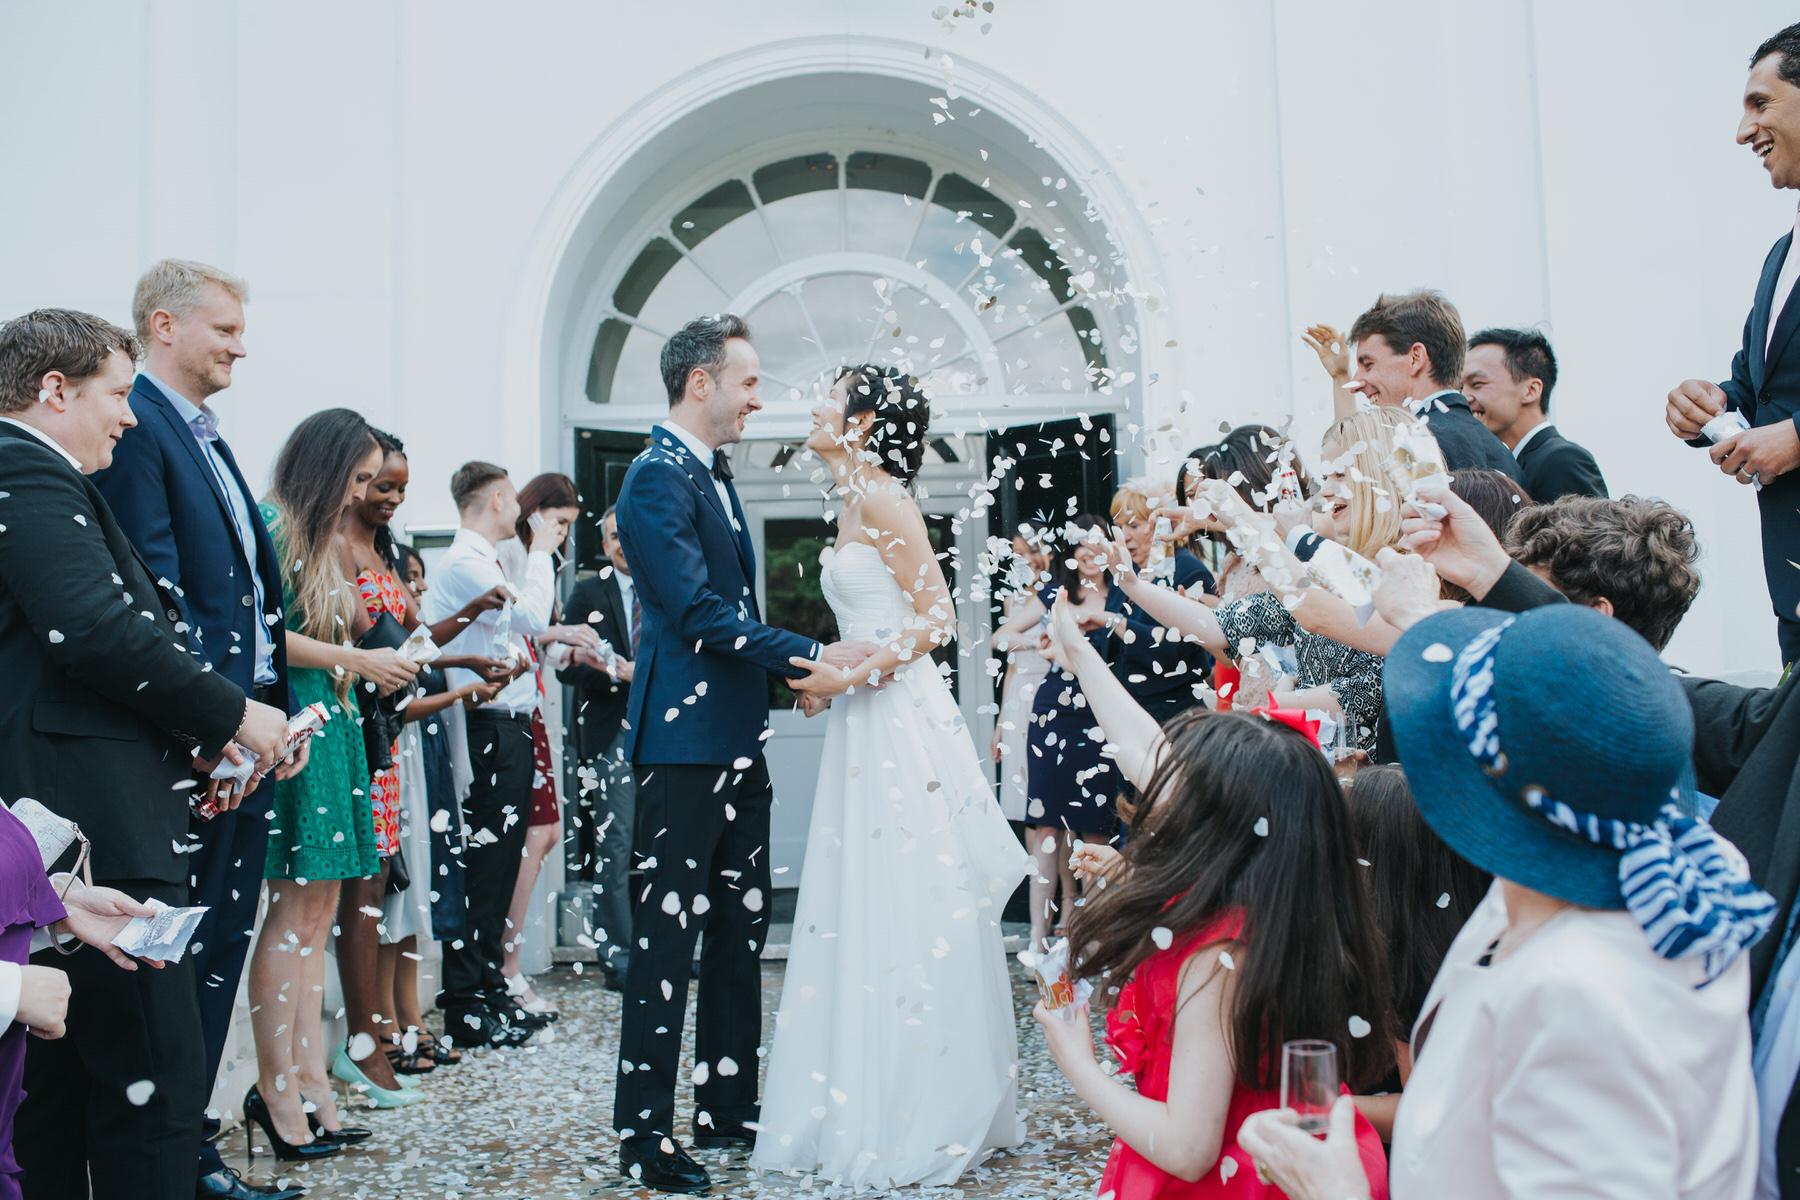 Belair House white confetti explosion reportage wedding.jpg